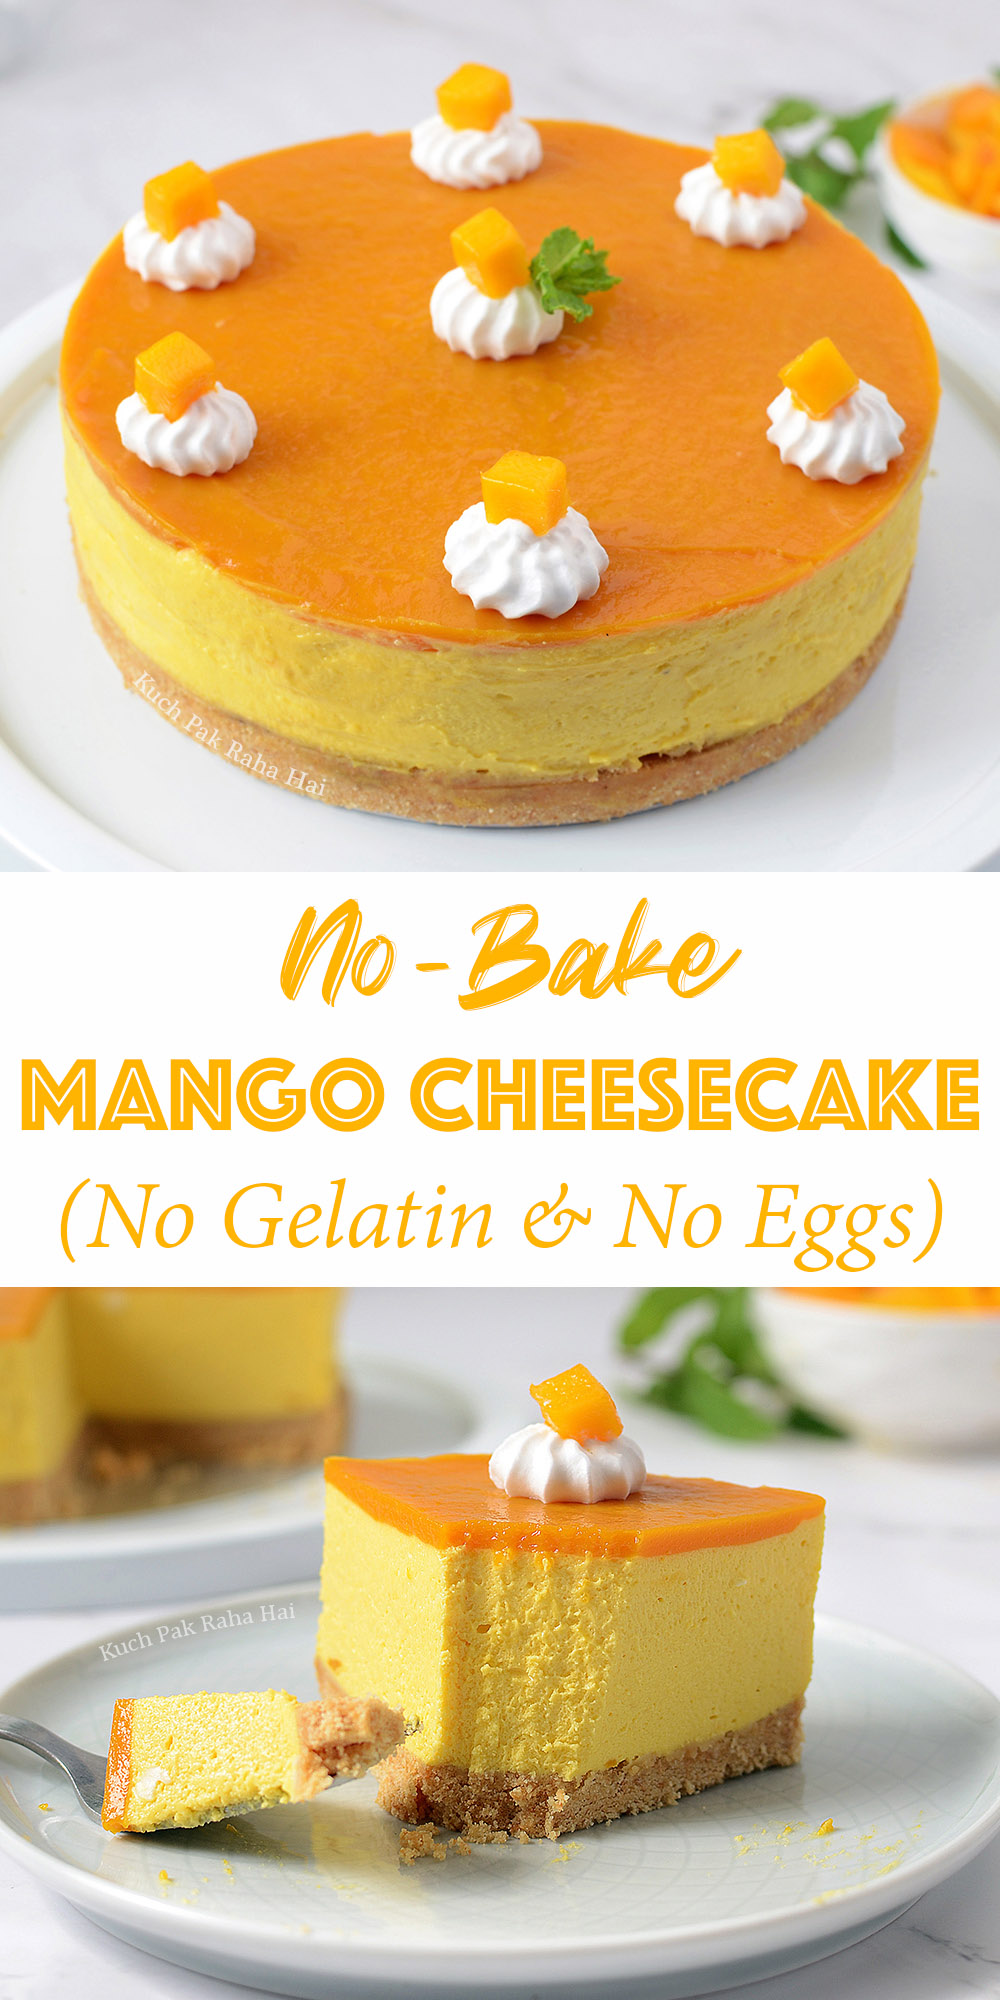 No Bake Mango Cheesecake without gelatin